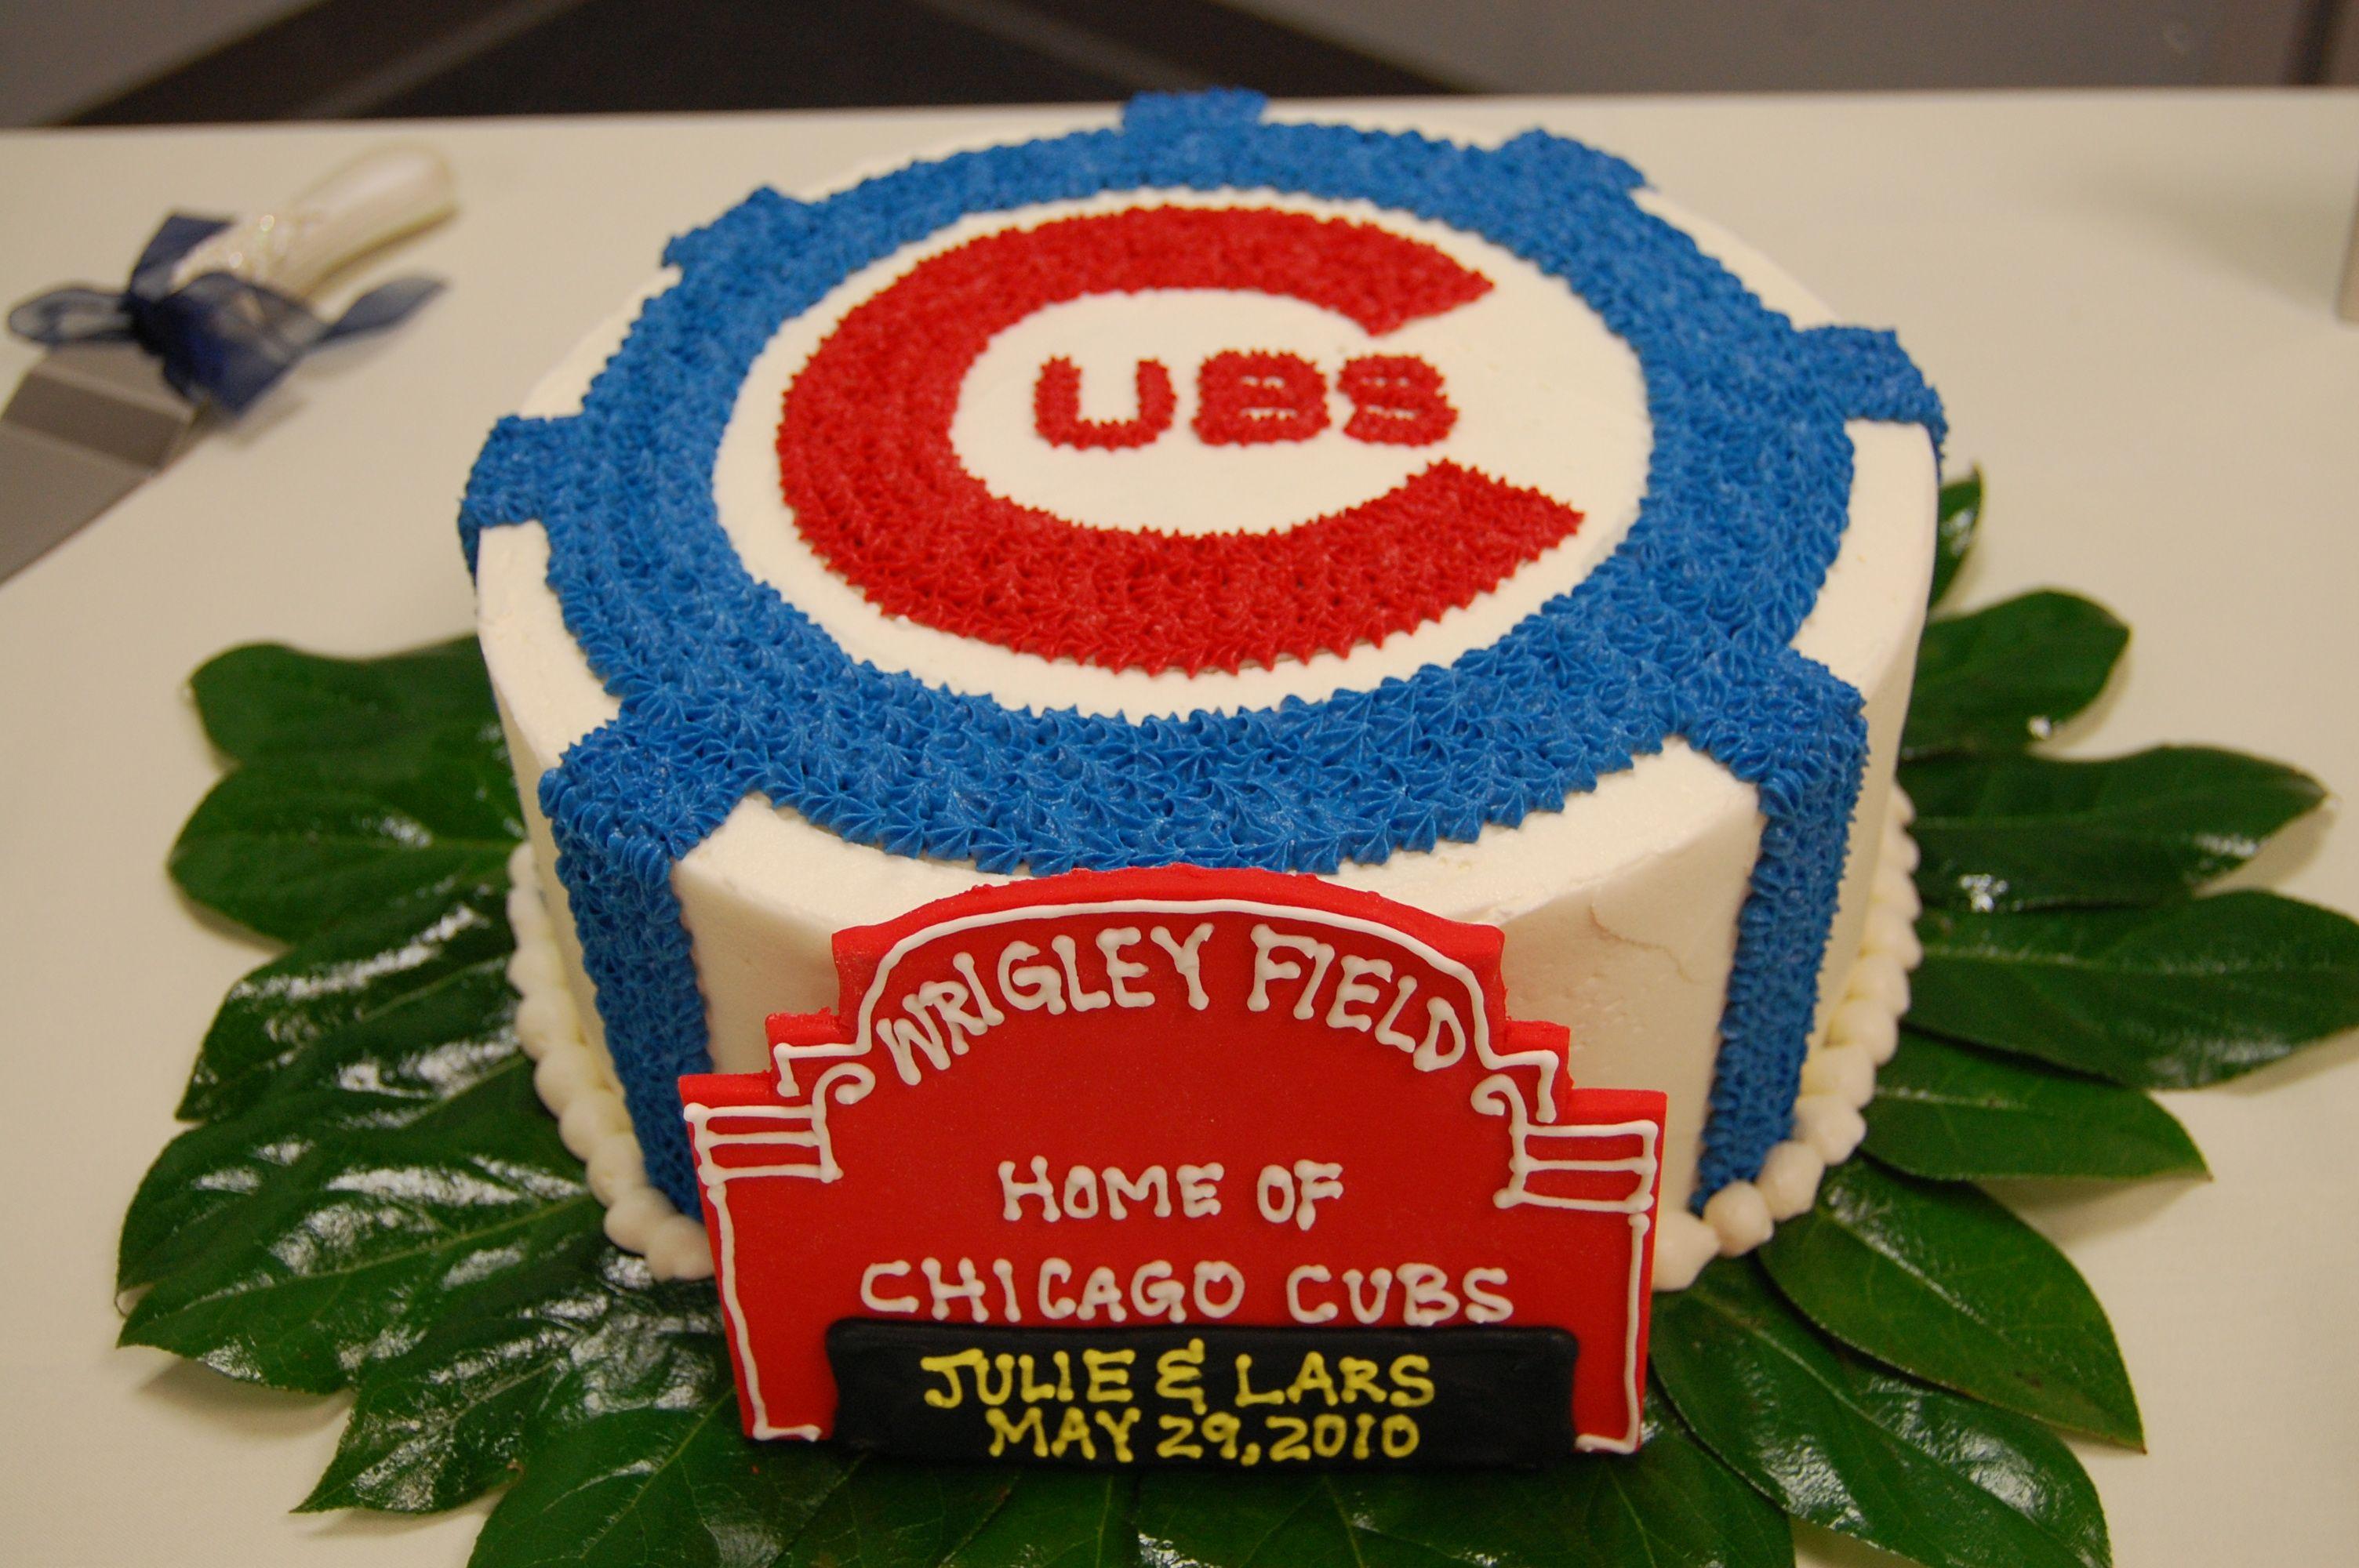 Pin By Kari Machal Designs On Wedding Inspiration Cubs Cake Chicago Cubs Cake My Birthday Cake